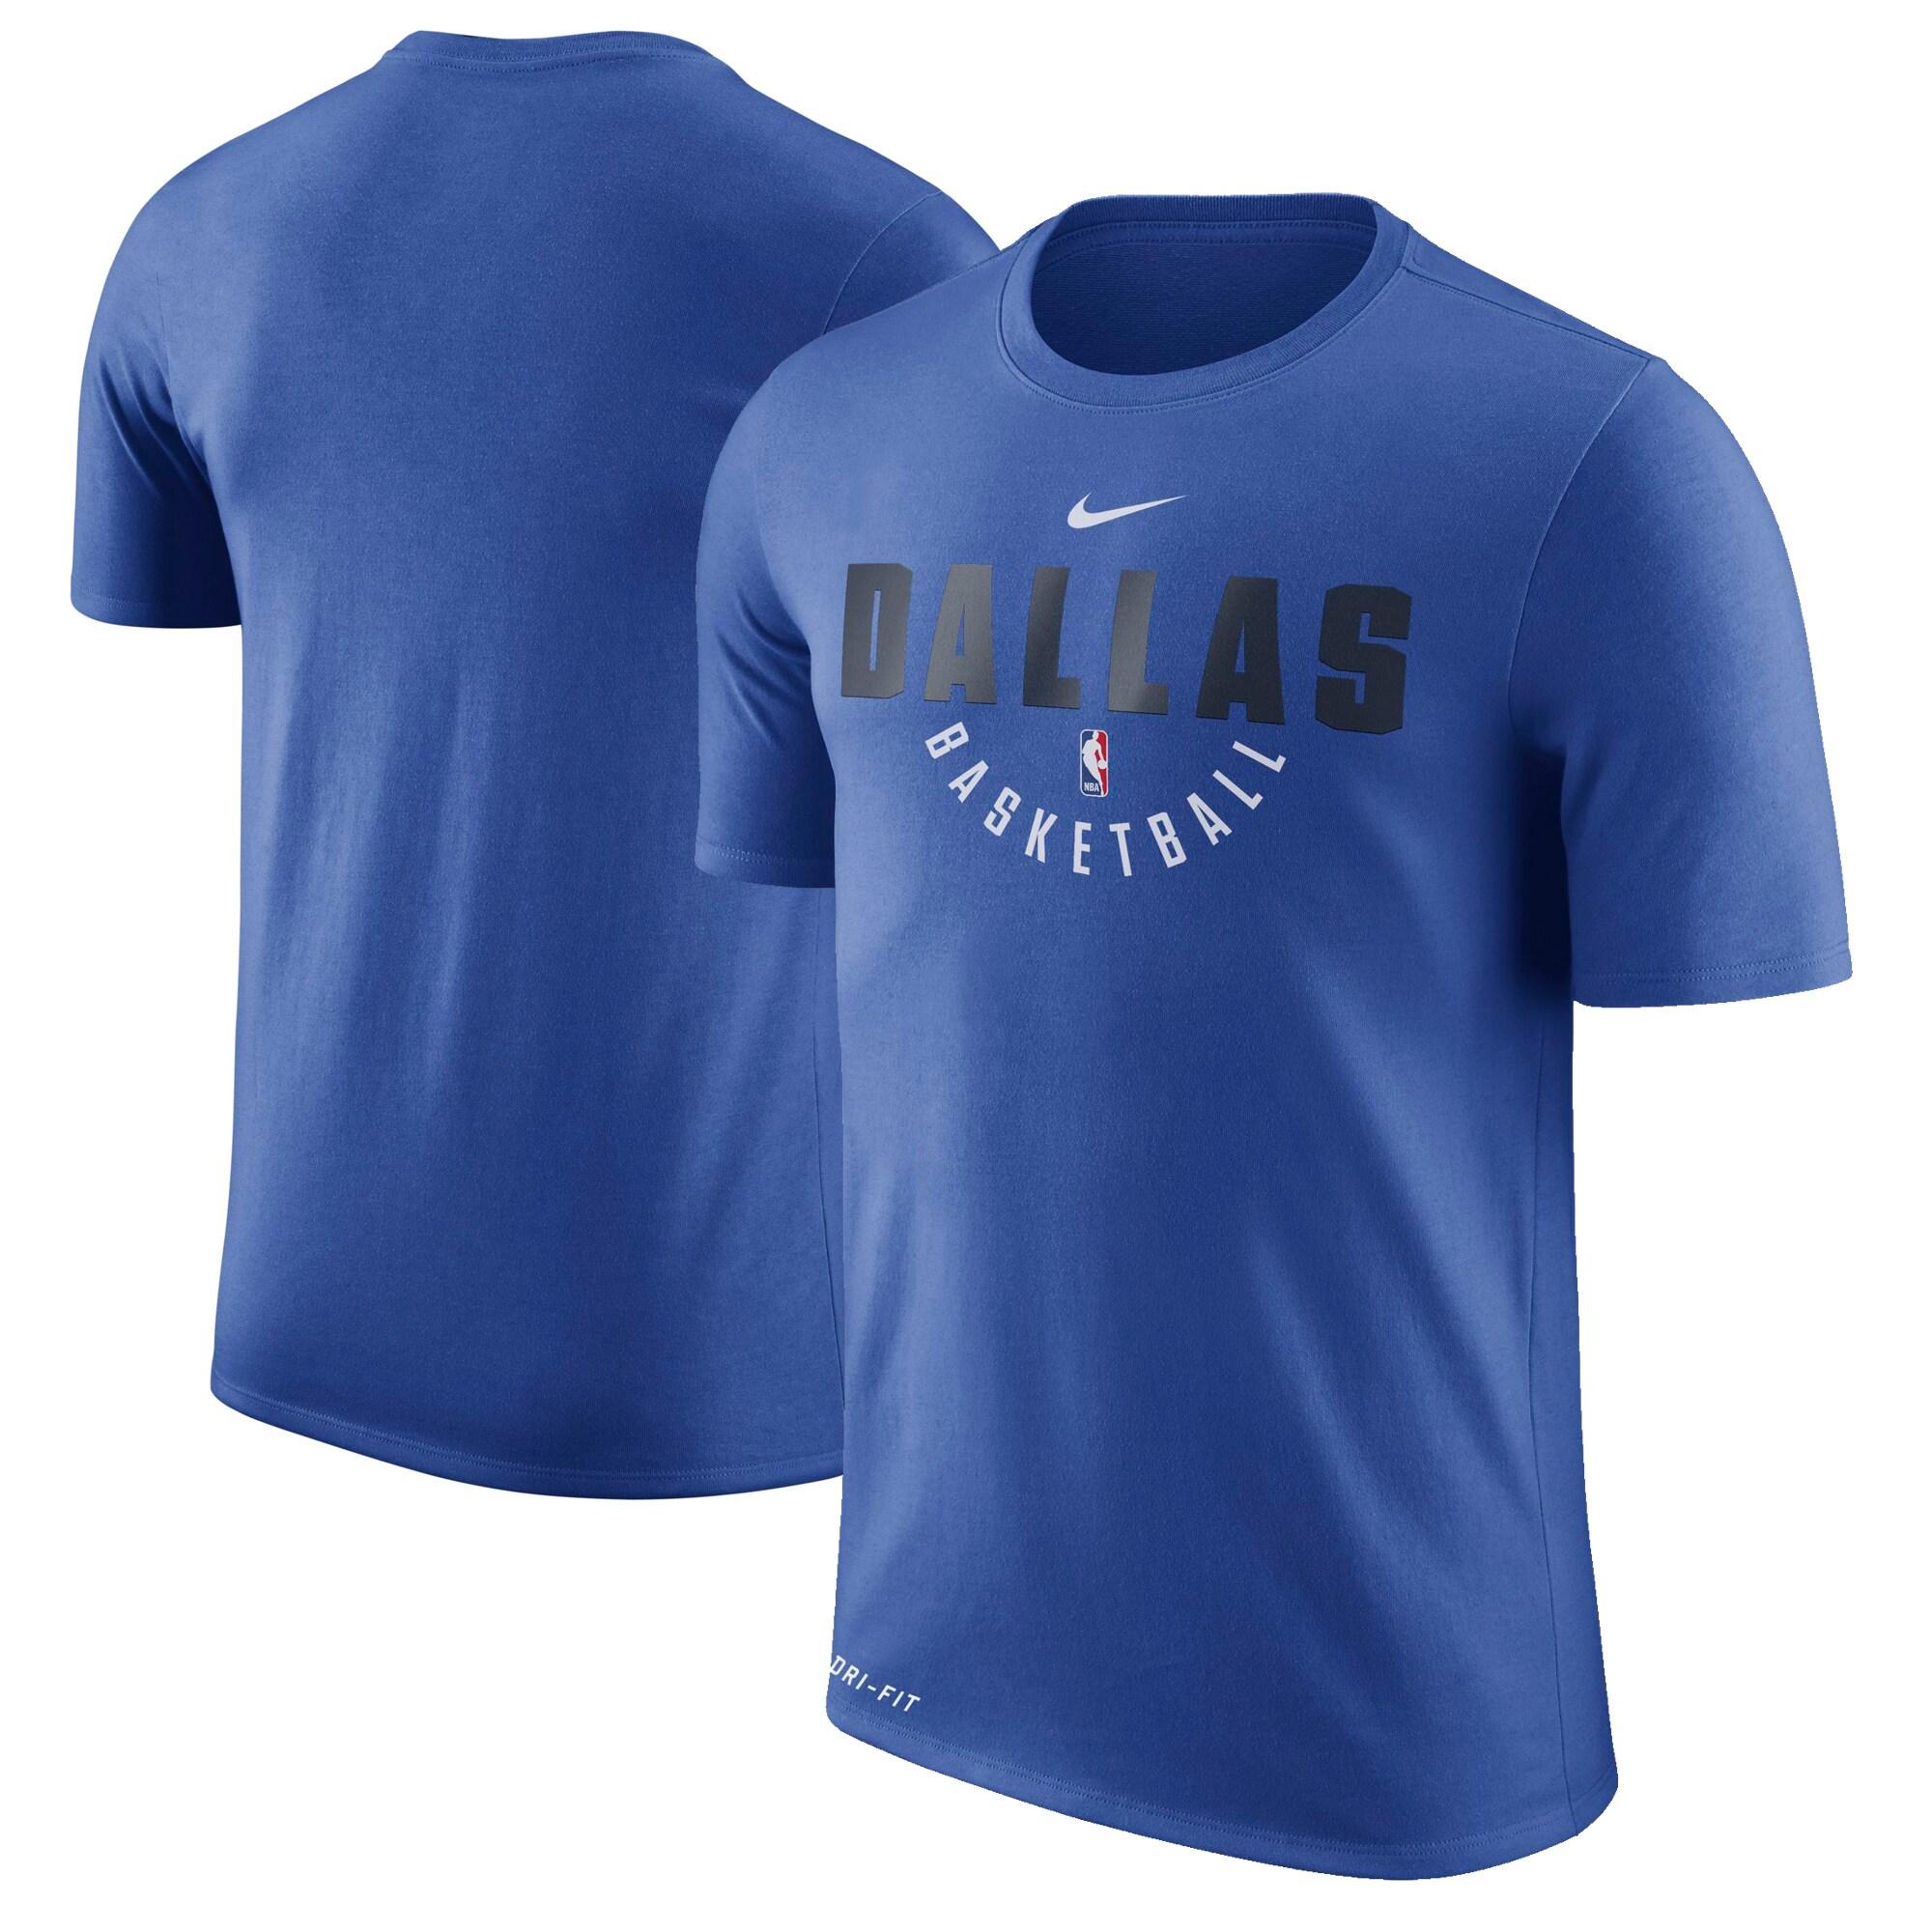 Dallas Mavericks Nike Practice Performance T-Shirt - Blue